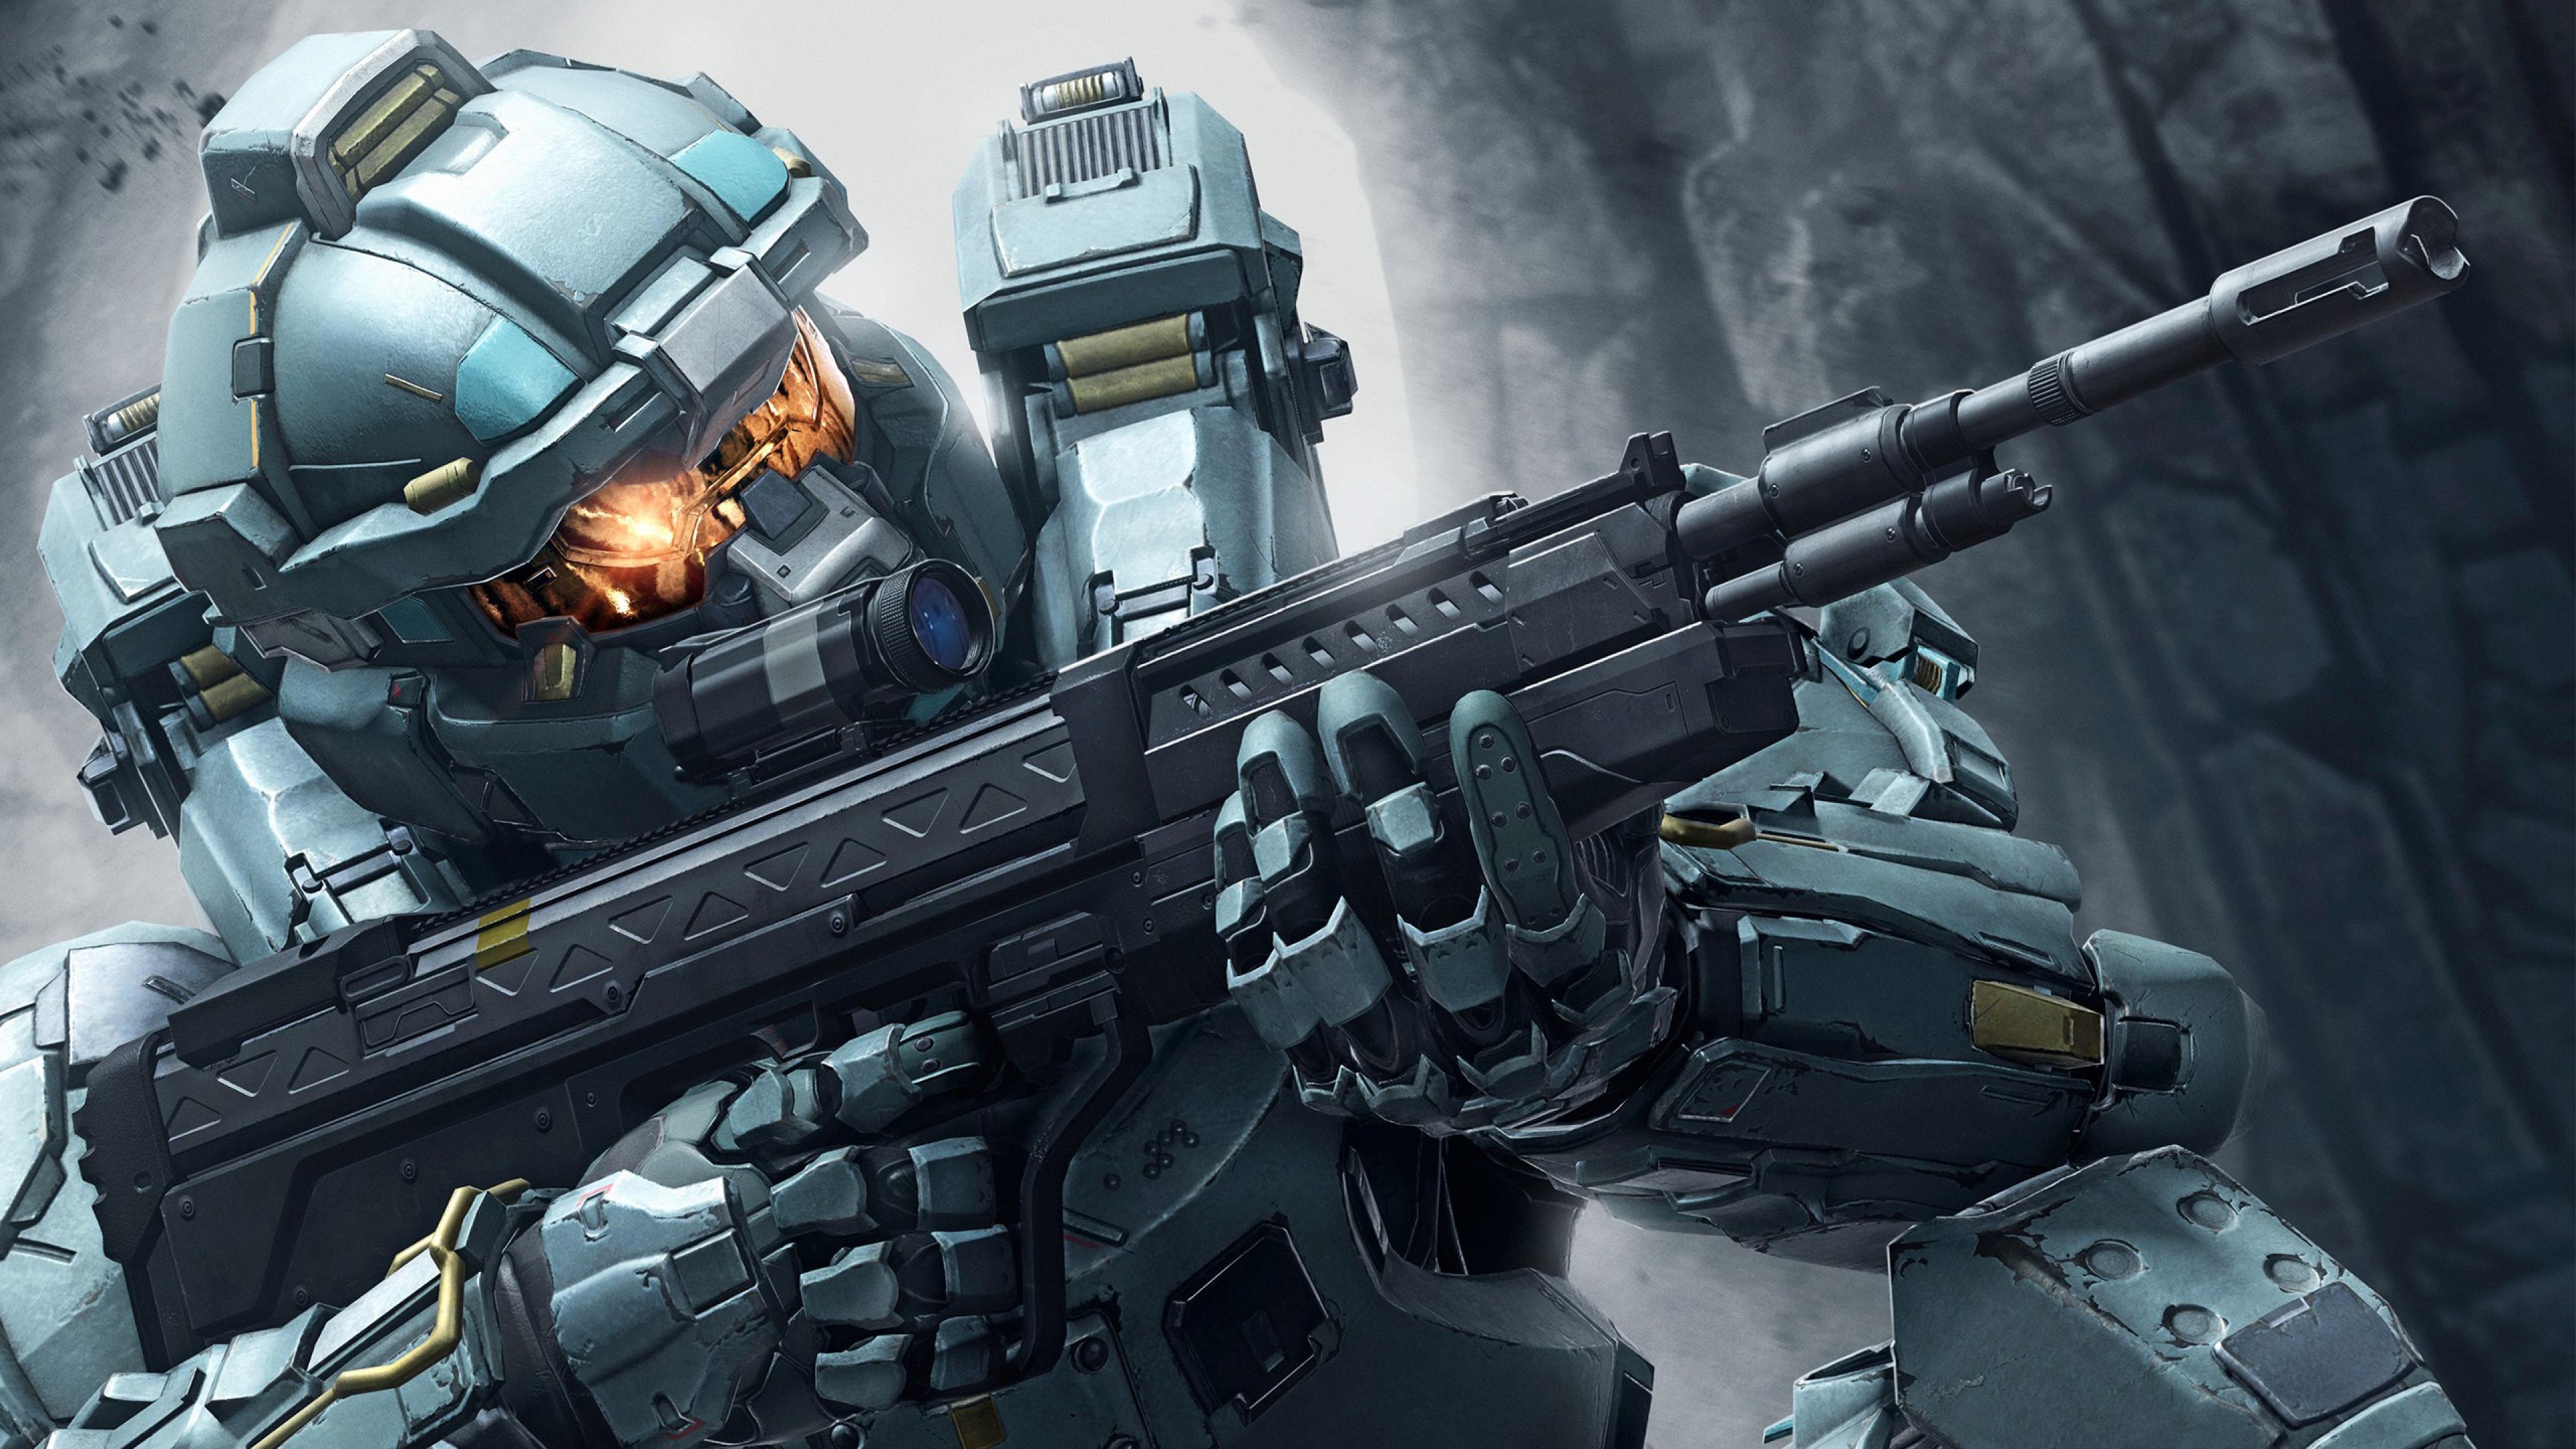 Halo 5 (1440P Resolution)